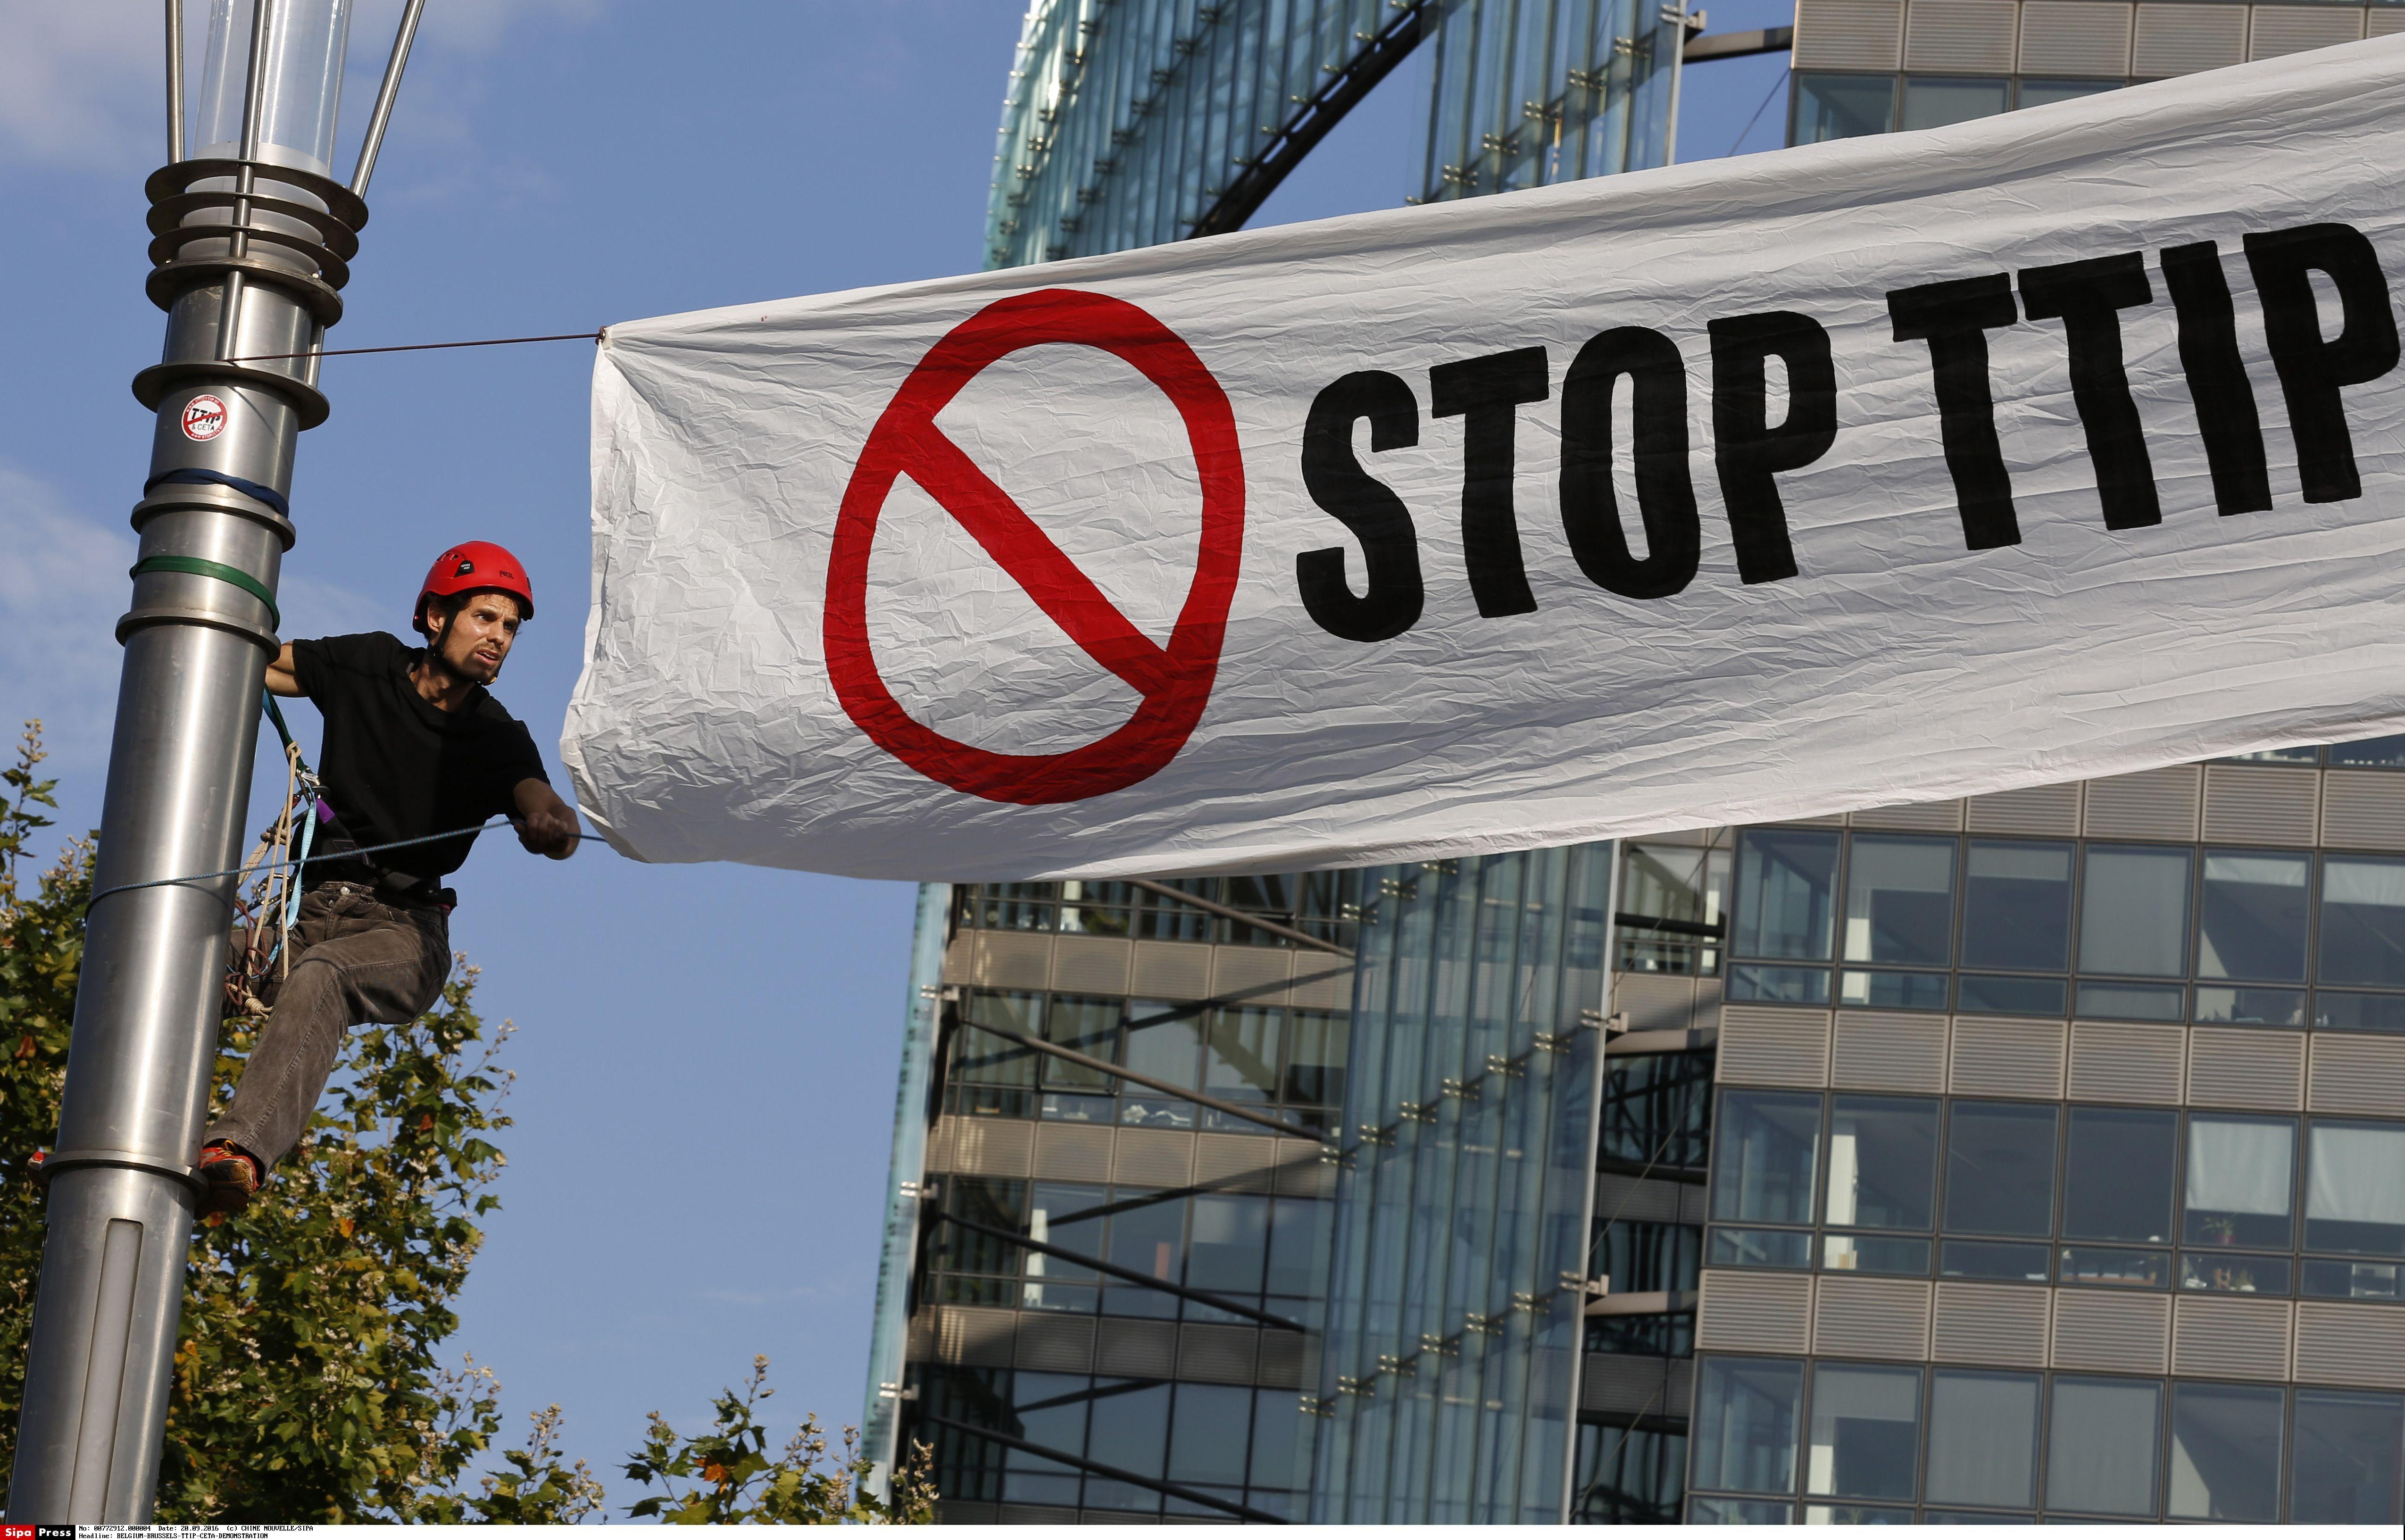 ES ir JAV�derybos d�l laisvosios prekybos visi�kai i�sikv�p�